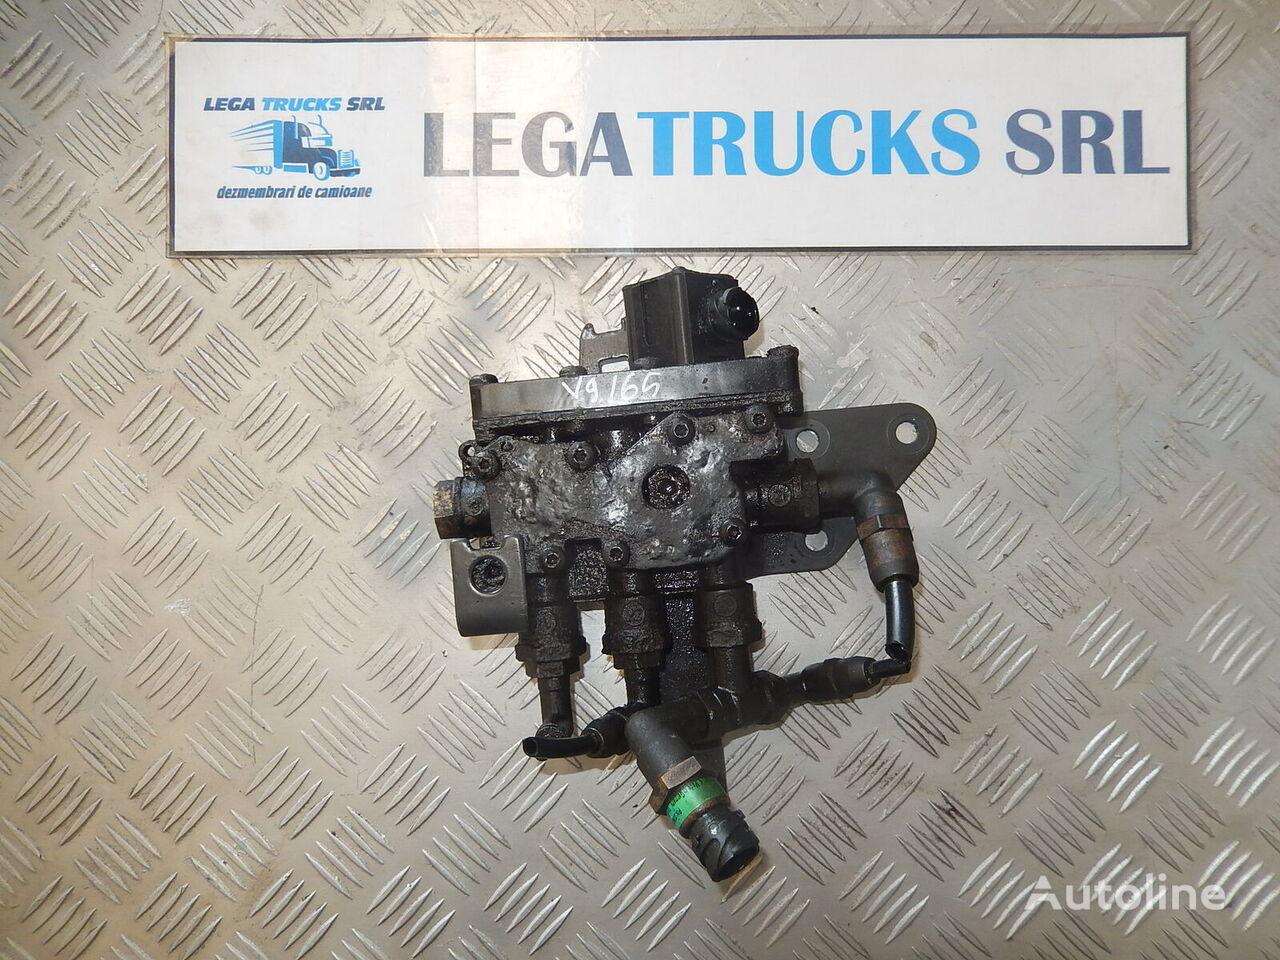 VOLVO Supapa ECAS FH13 / V9/65 / 4728800023 pneumatic valve for VOLVO FH tractor unit